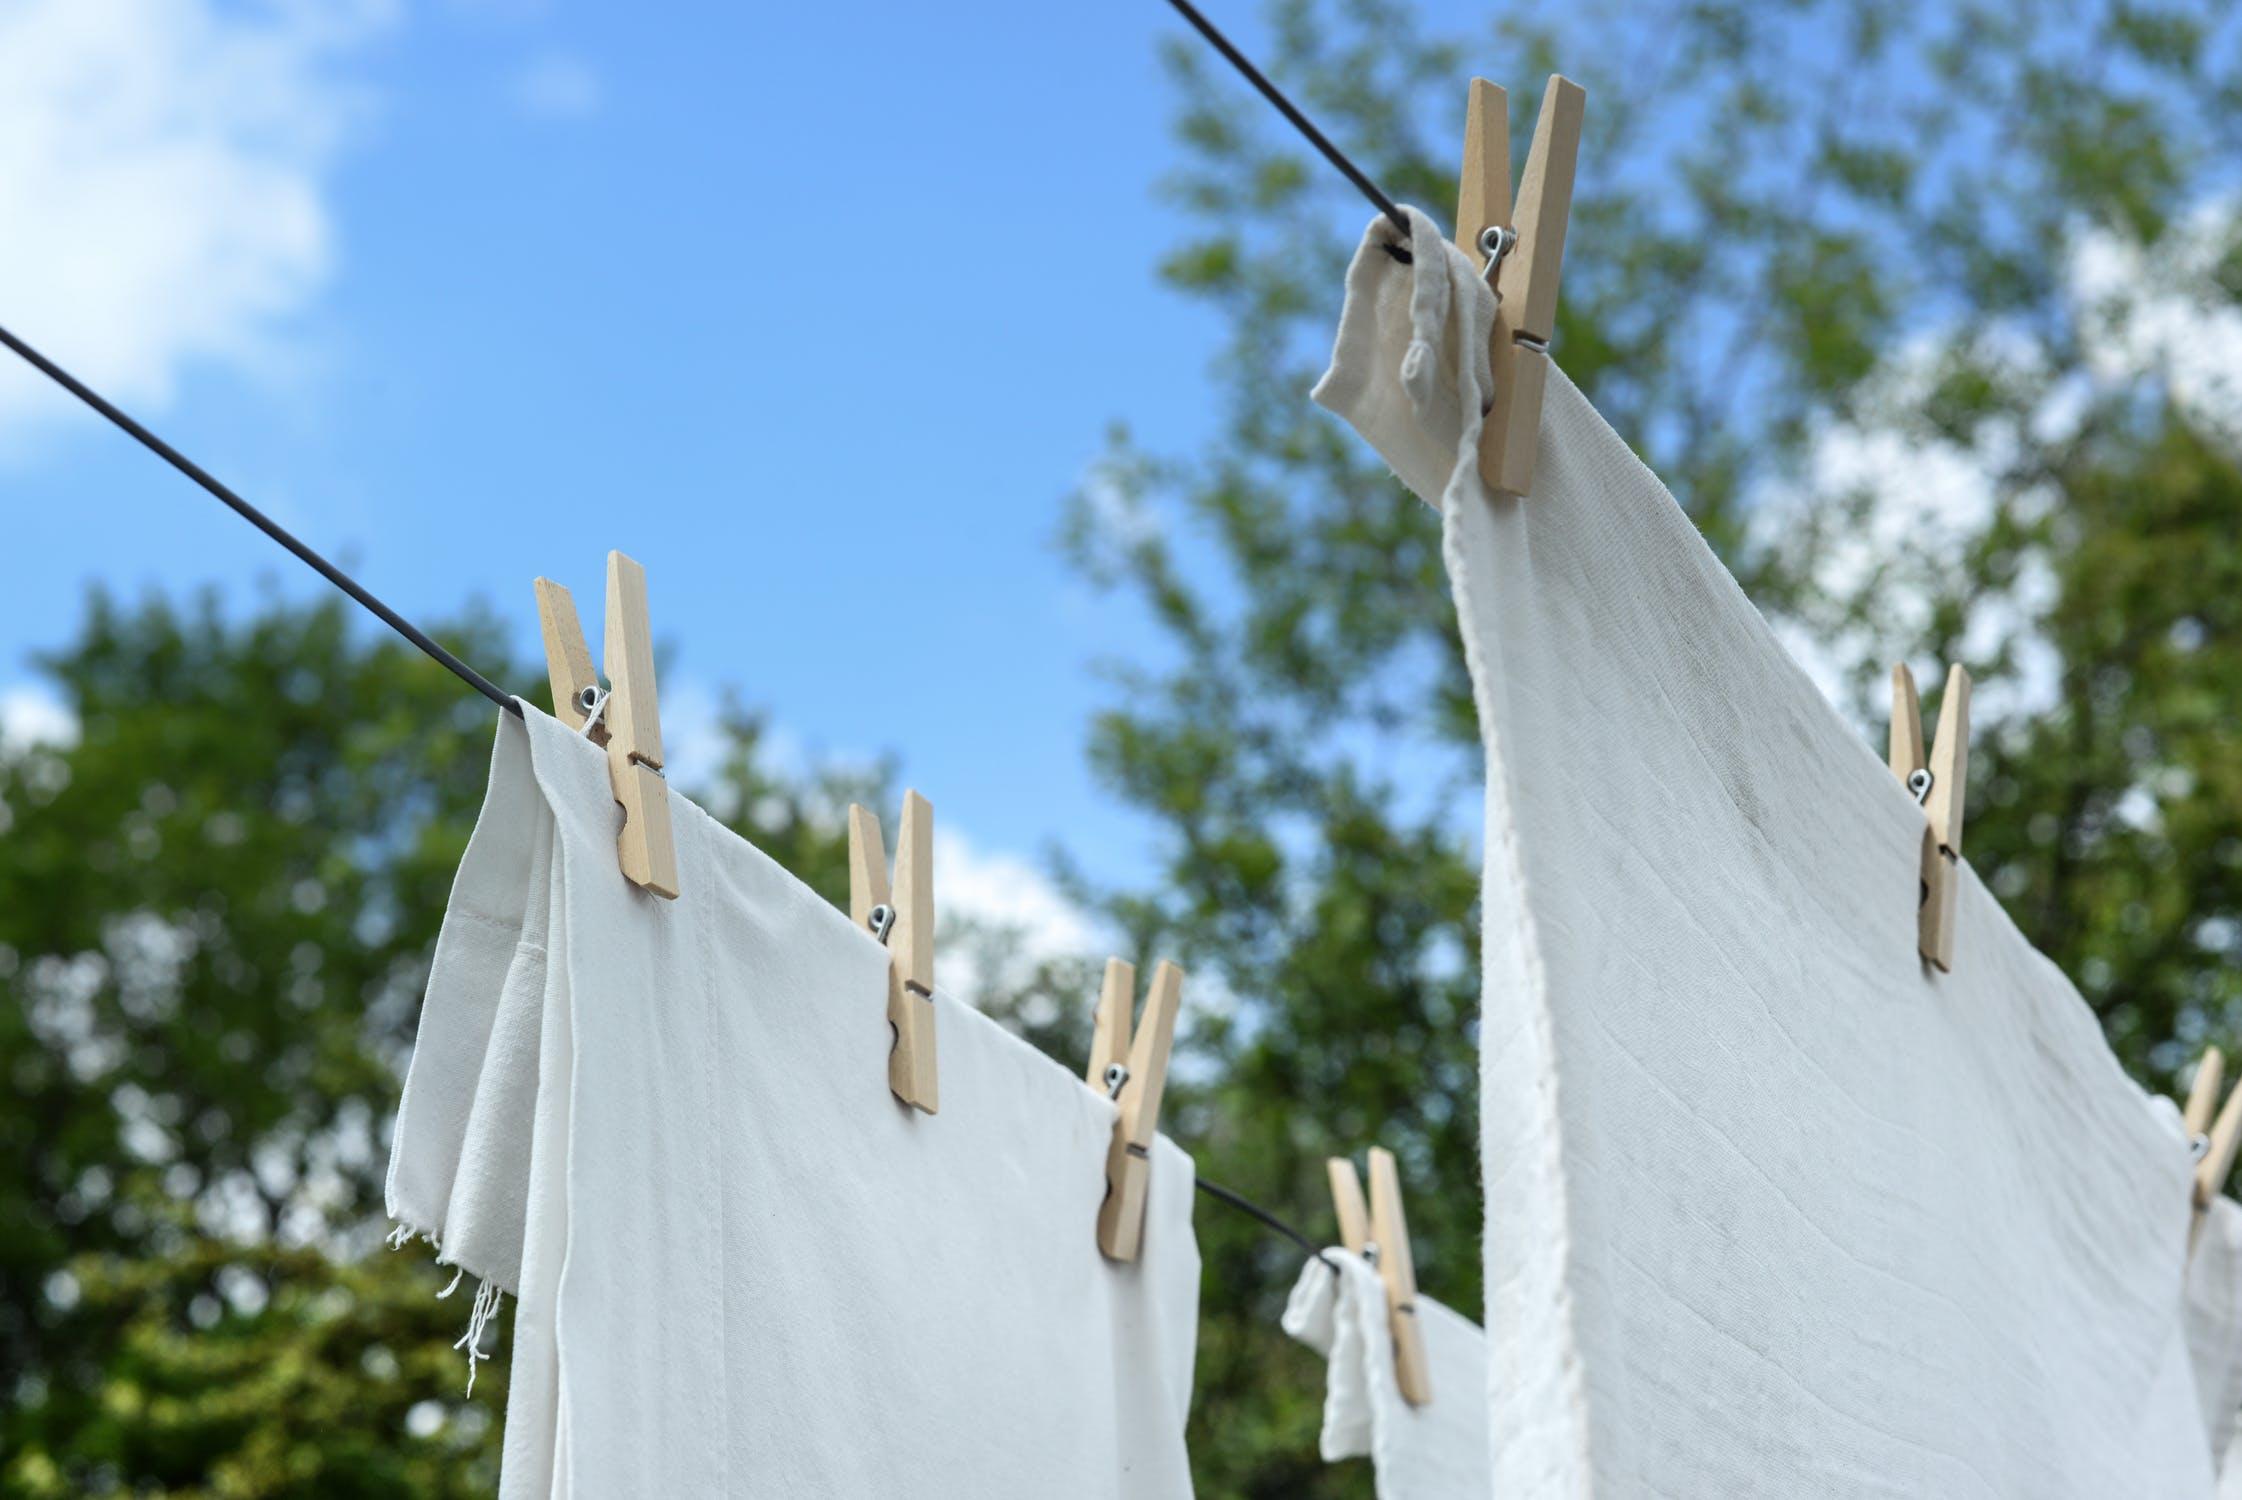 Image of Drying Laundry